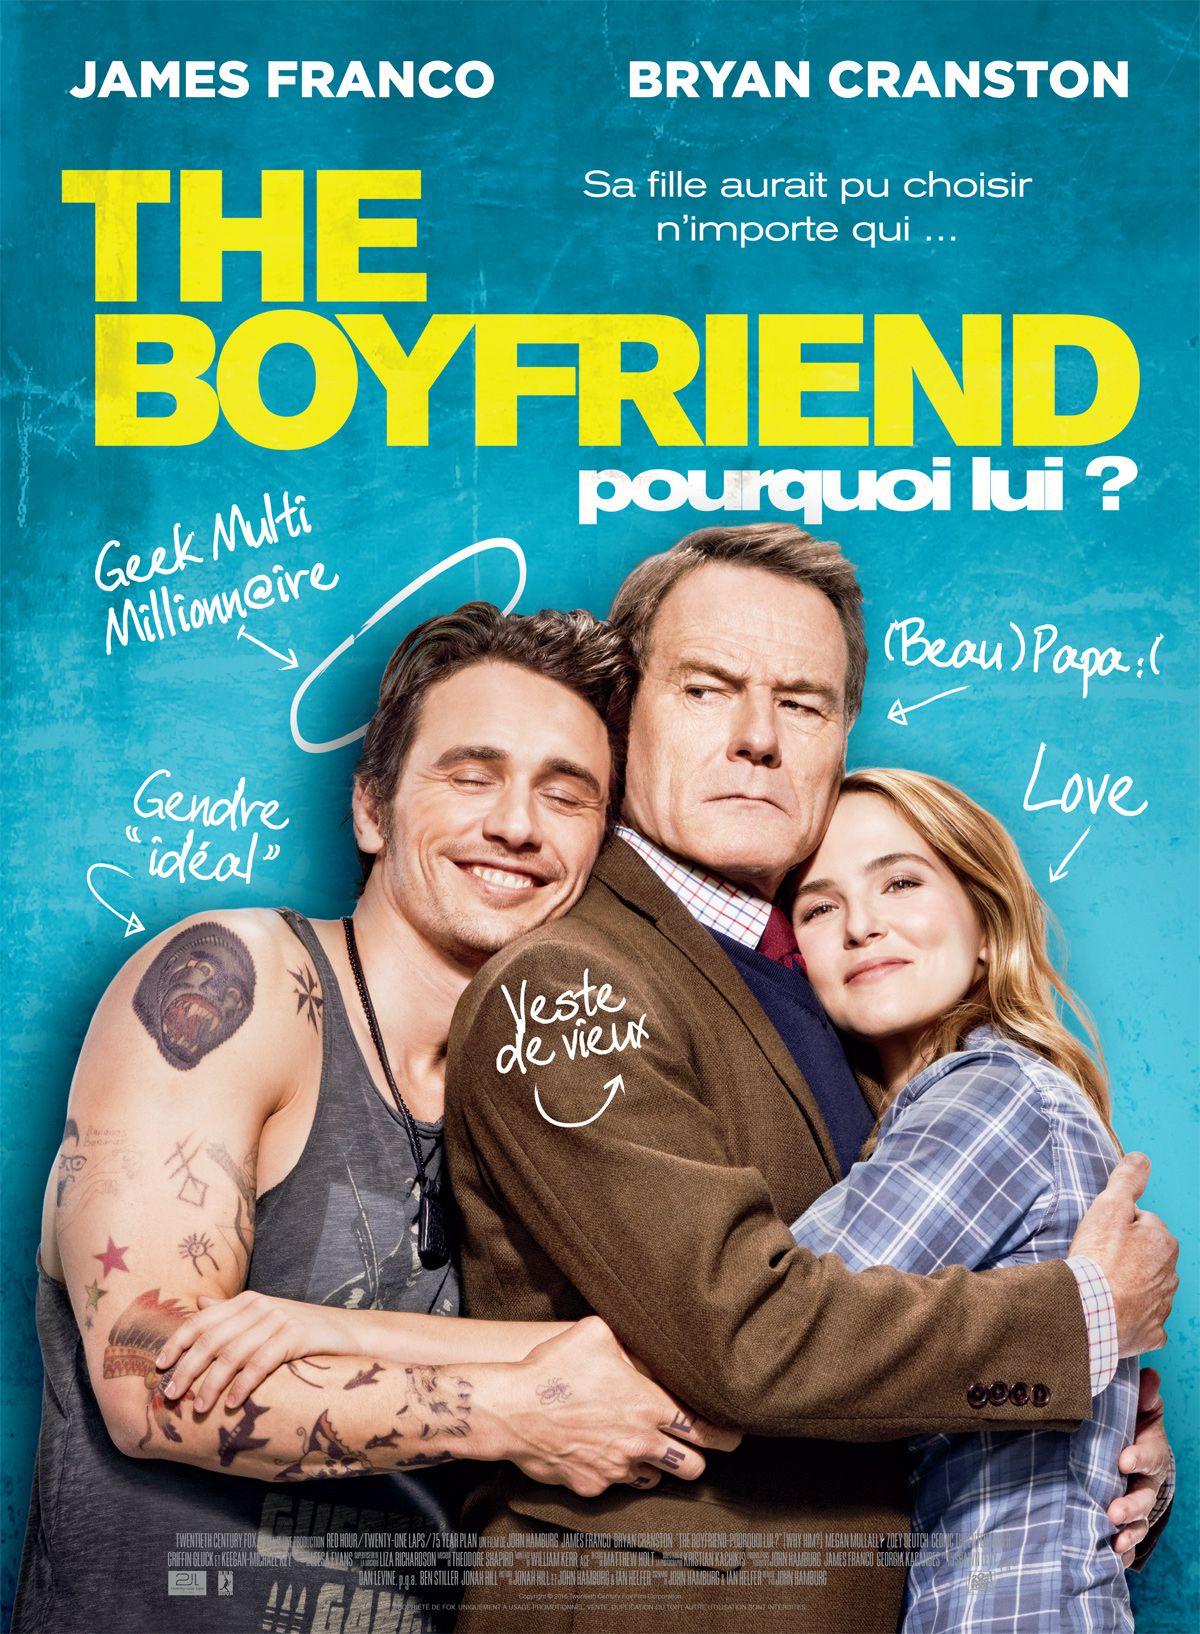 The Boyfriend : Pourquoi lui ? - Film (2017)